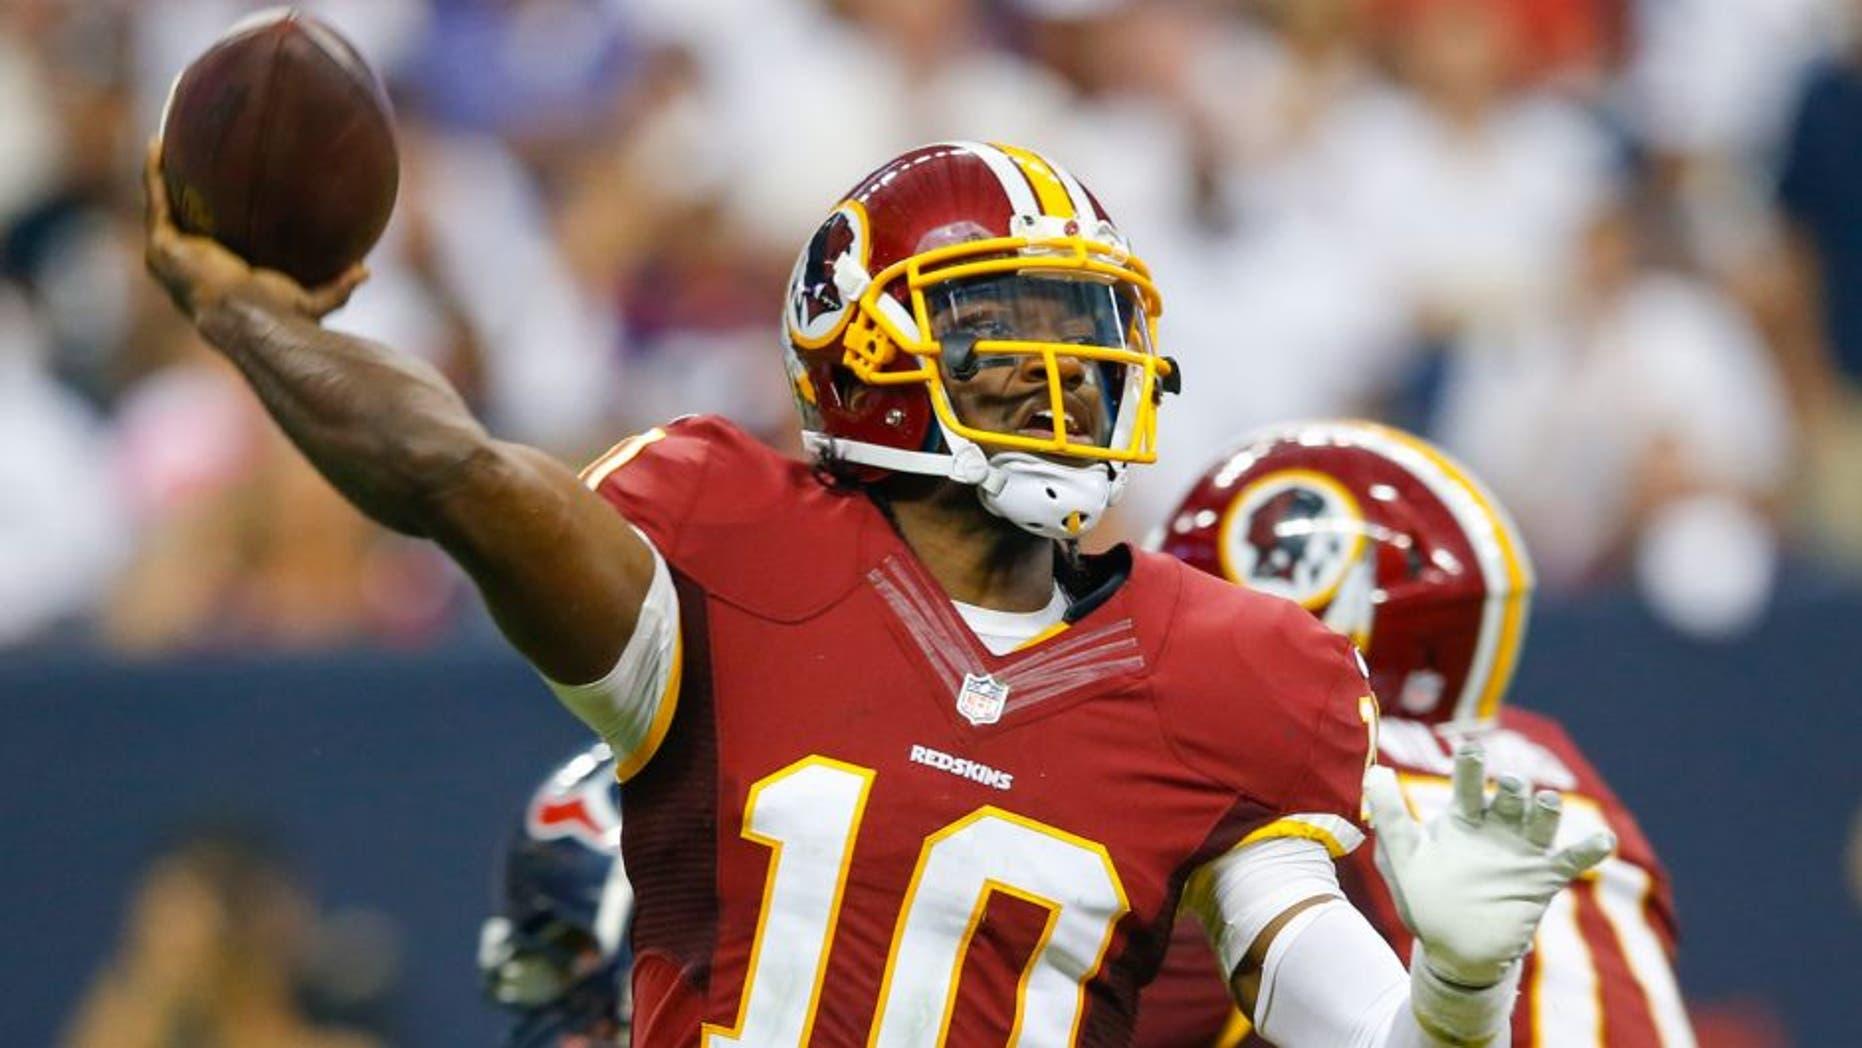 Sep 7, 2014; Houston, TX, USA; Washington Redskins quarterback Robert Griffin III (10) throws during the game against the Houston Texans at NRG Stadium. Mandatory Credit: Kevin Jairaj-USA TODAY Sports